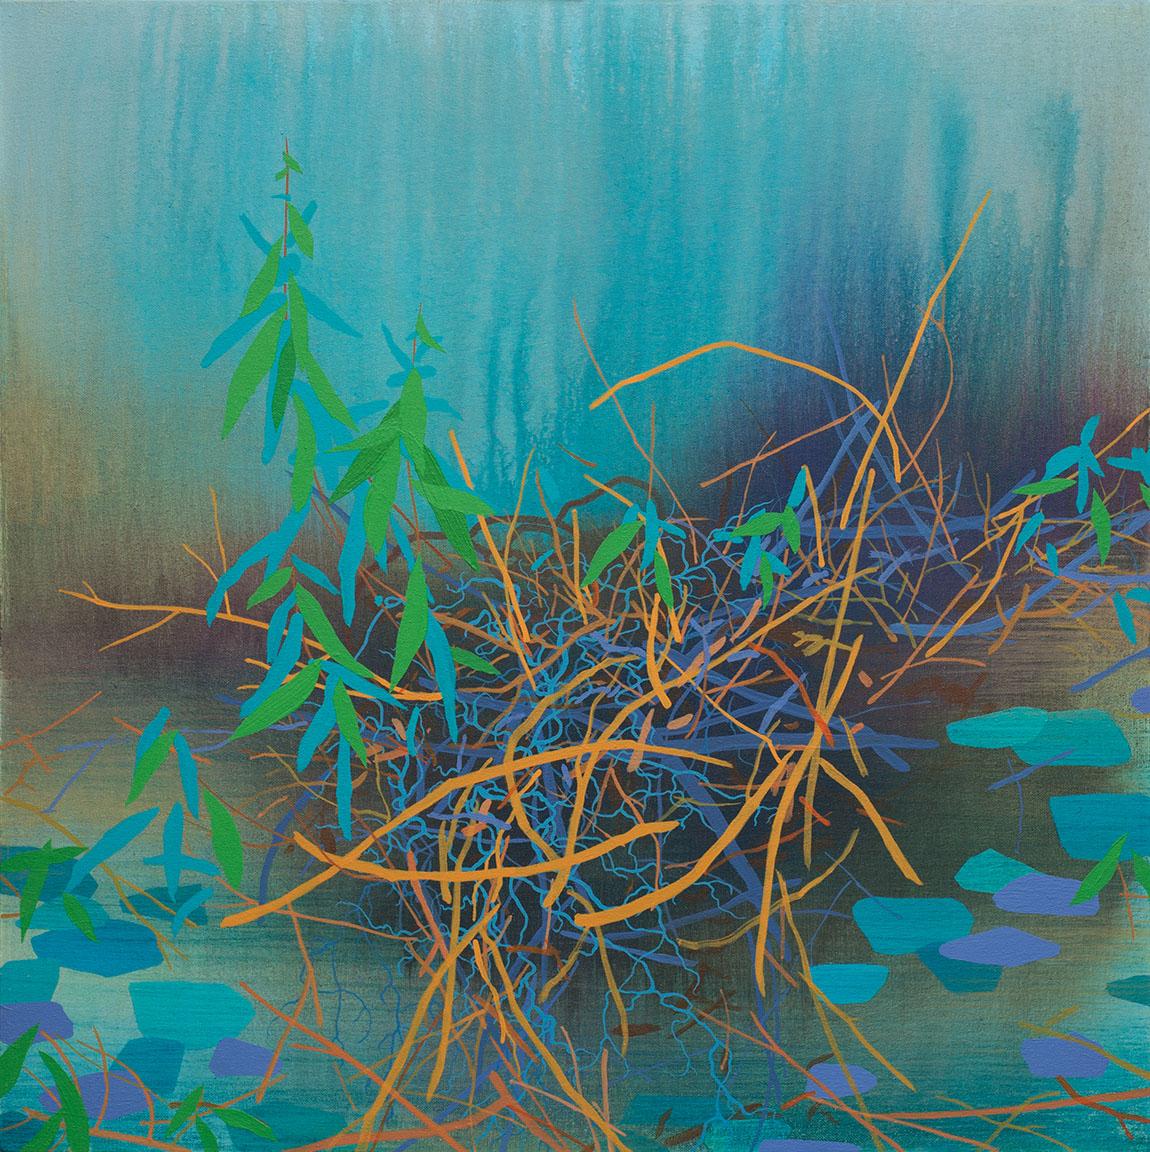 "Entangled Growth   Acrylic on canvas 24 x 24 x 1.5"" SOLD"